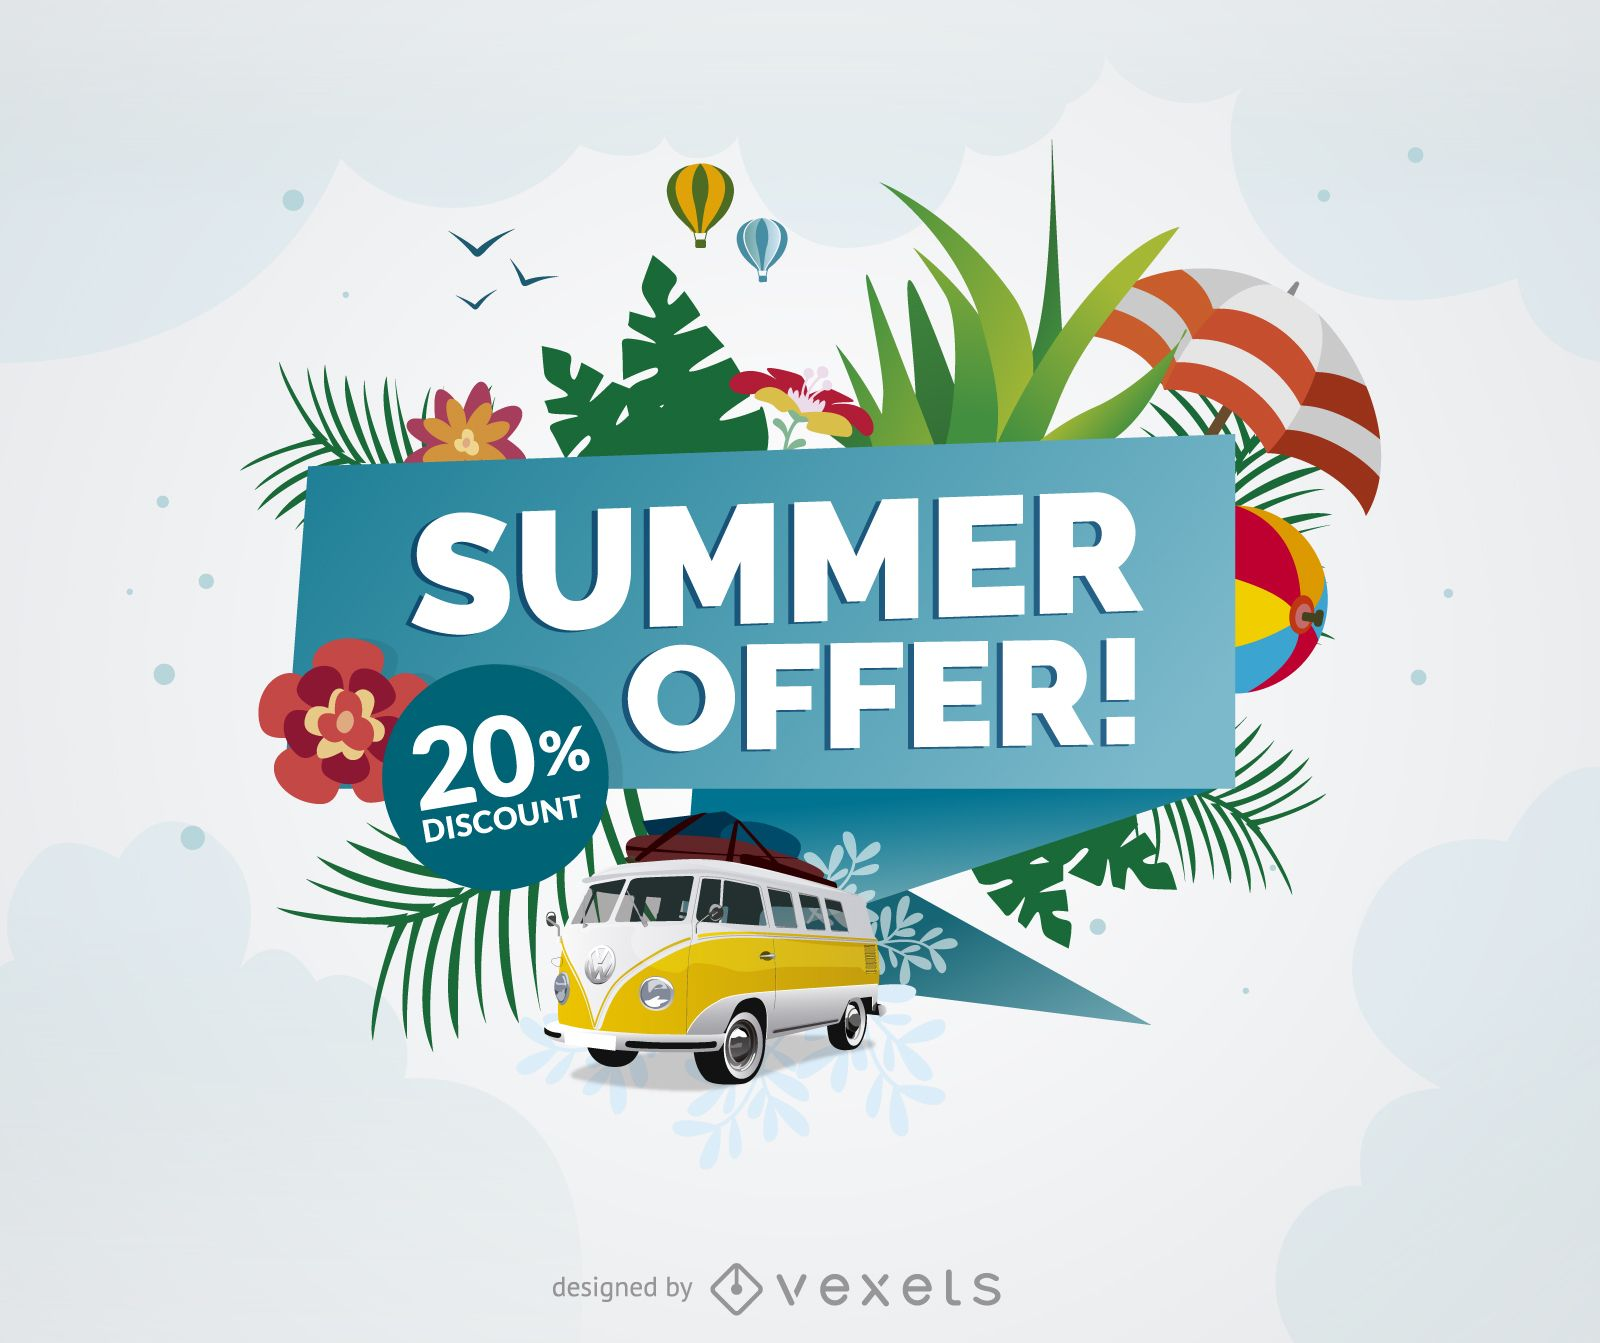 Summer offer promo poster